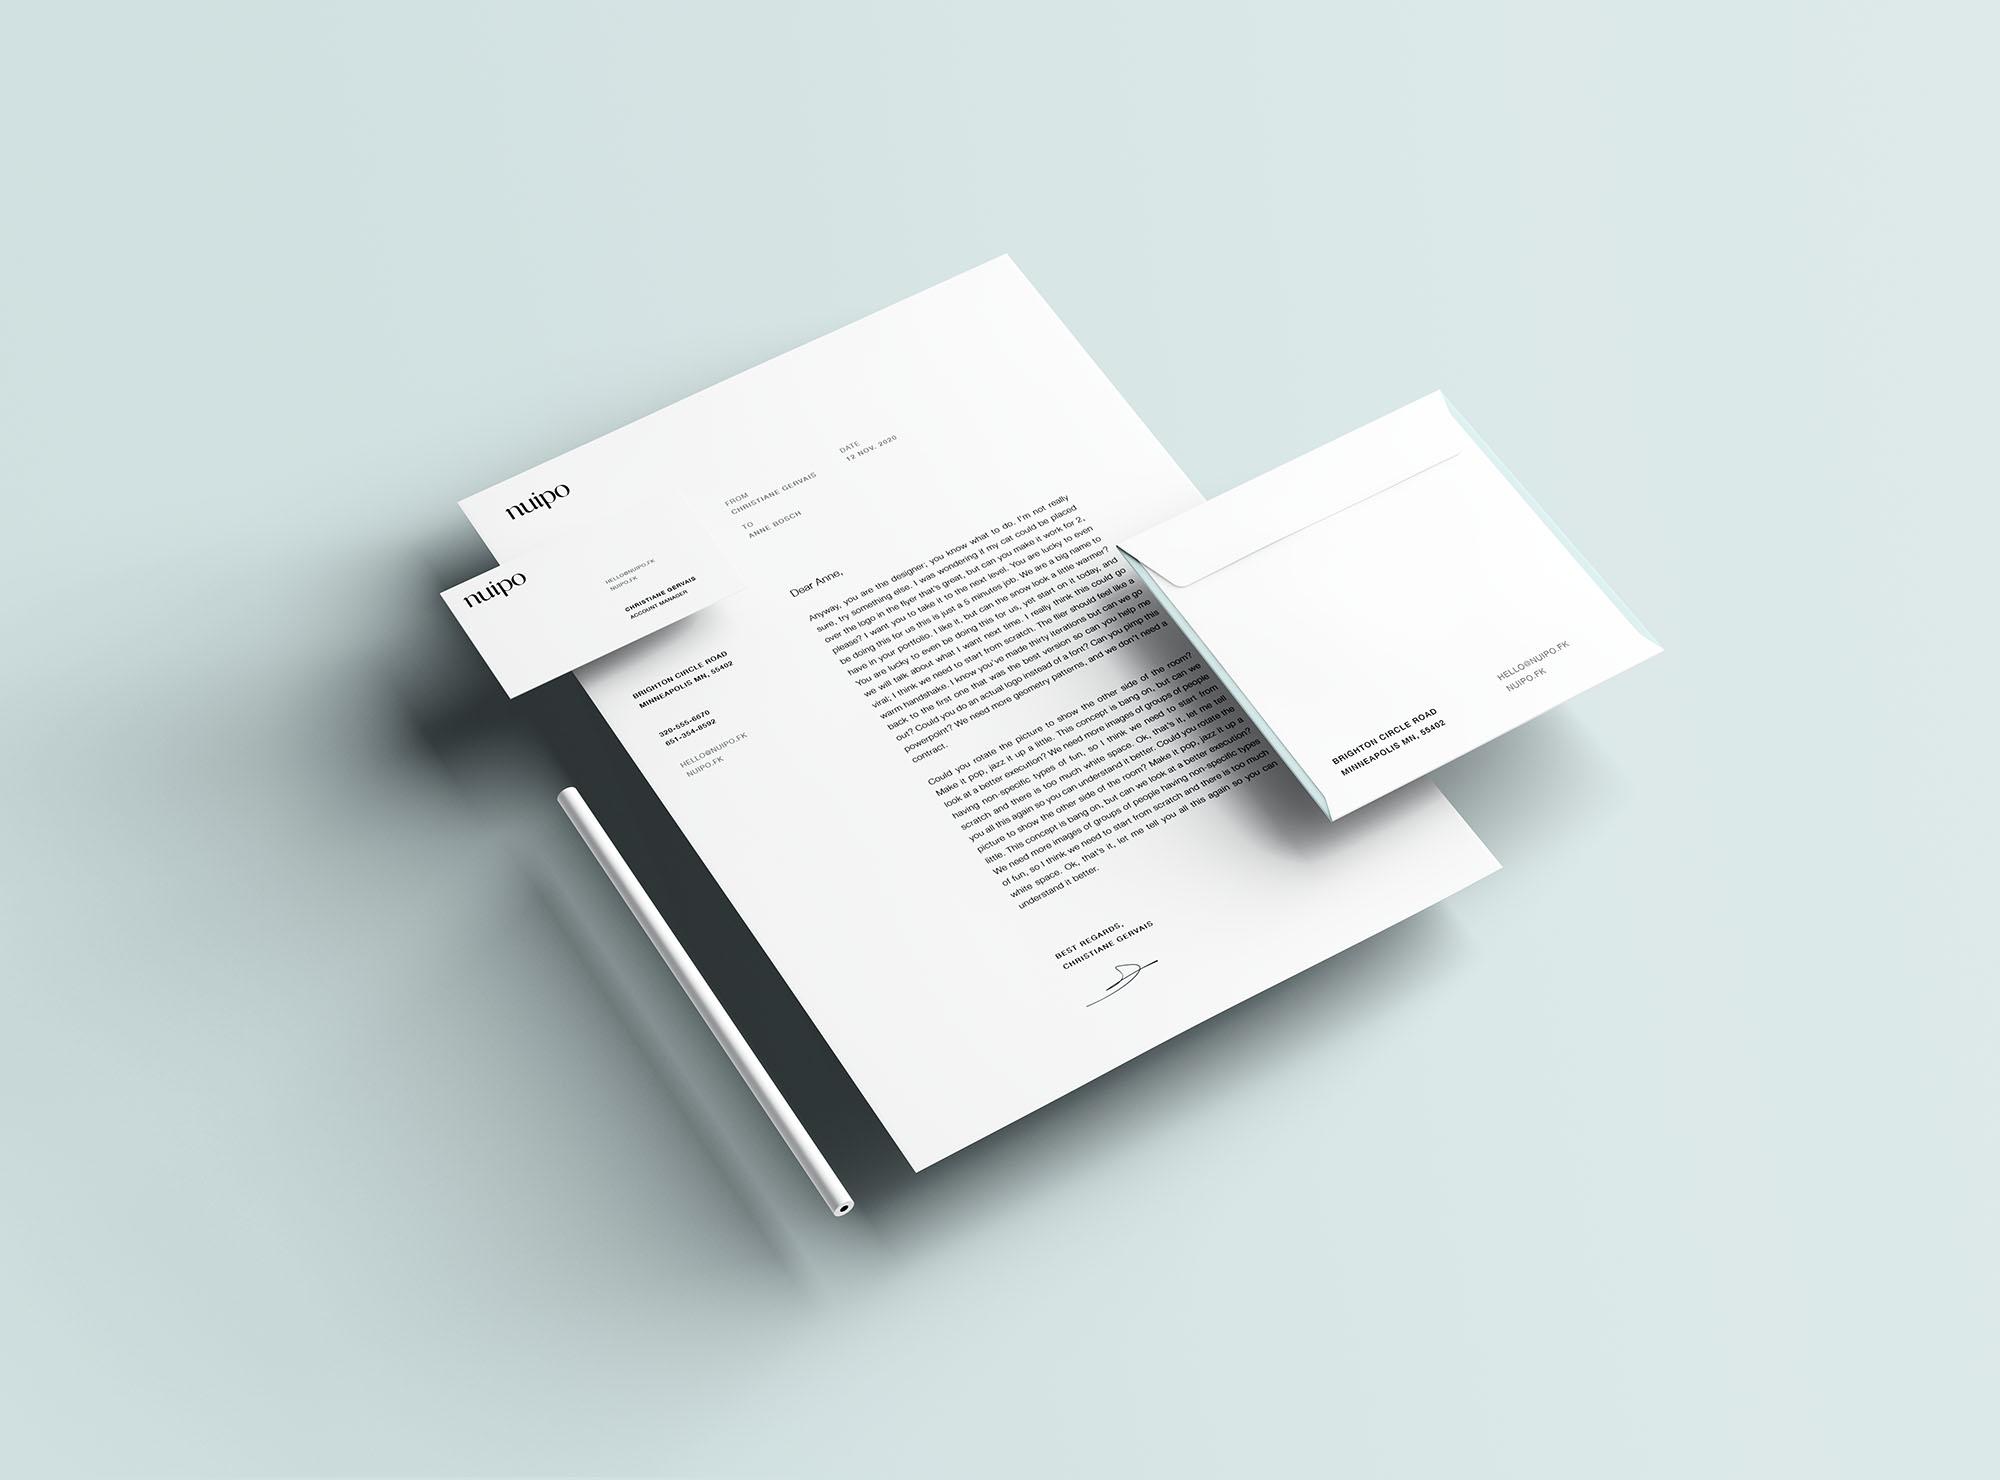 Branding Presentation Mockup 4